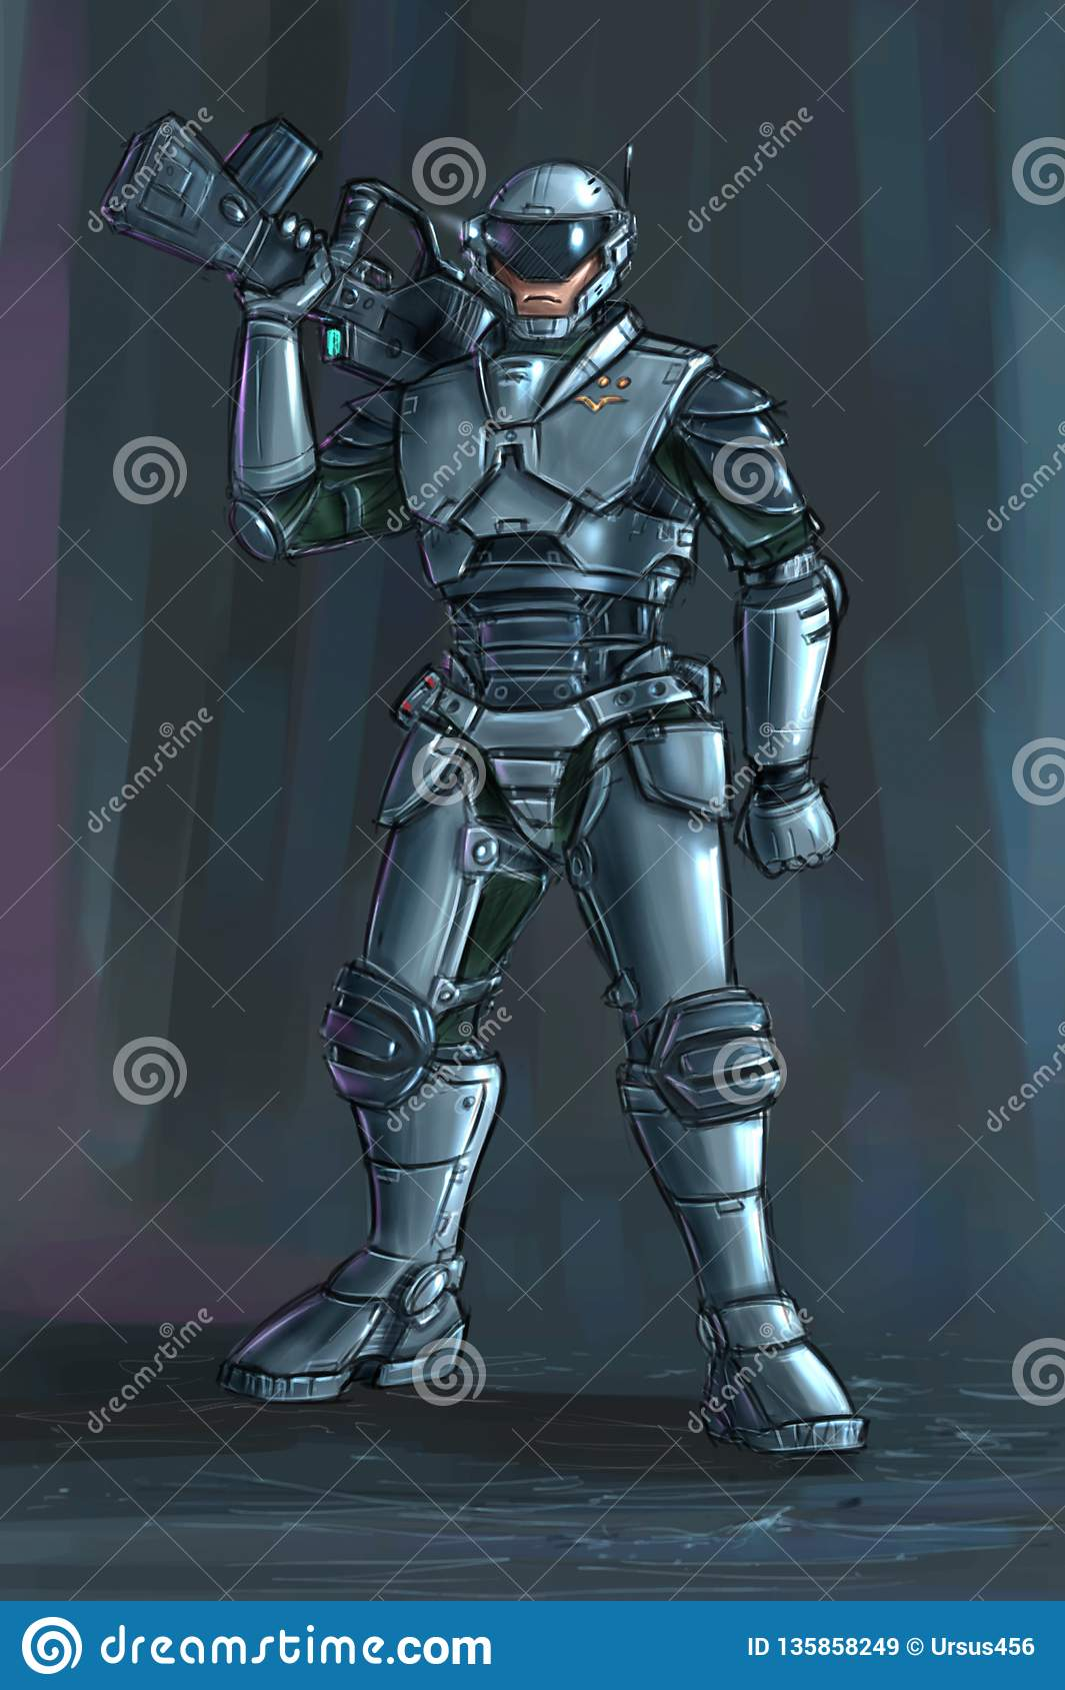 Concept Art Science Fiction Illustration Of Futuristic Soldier